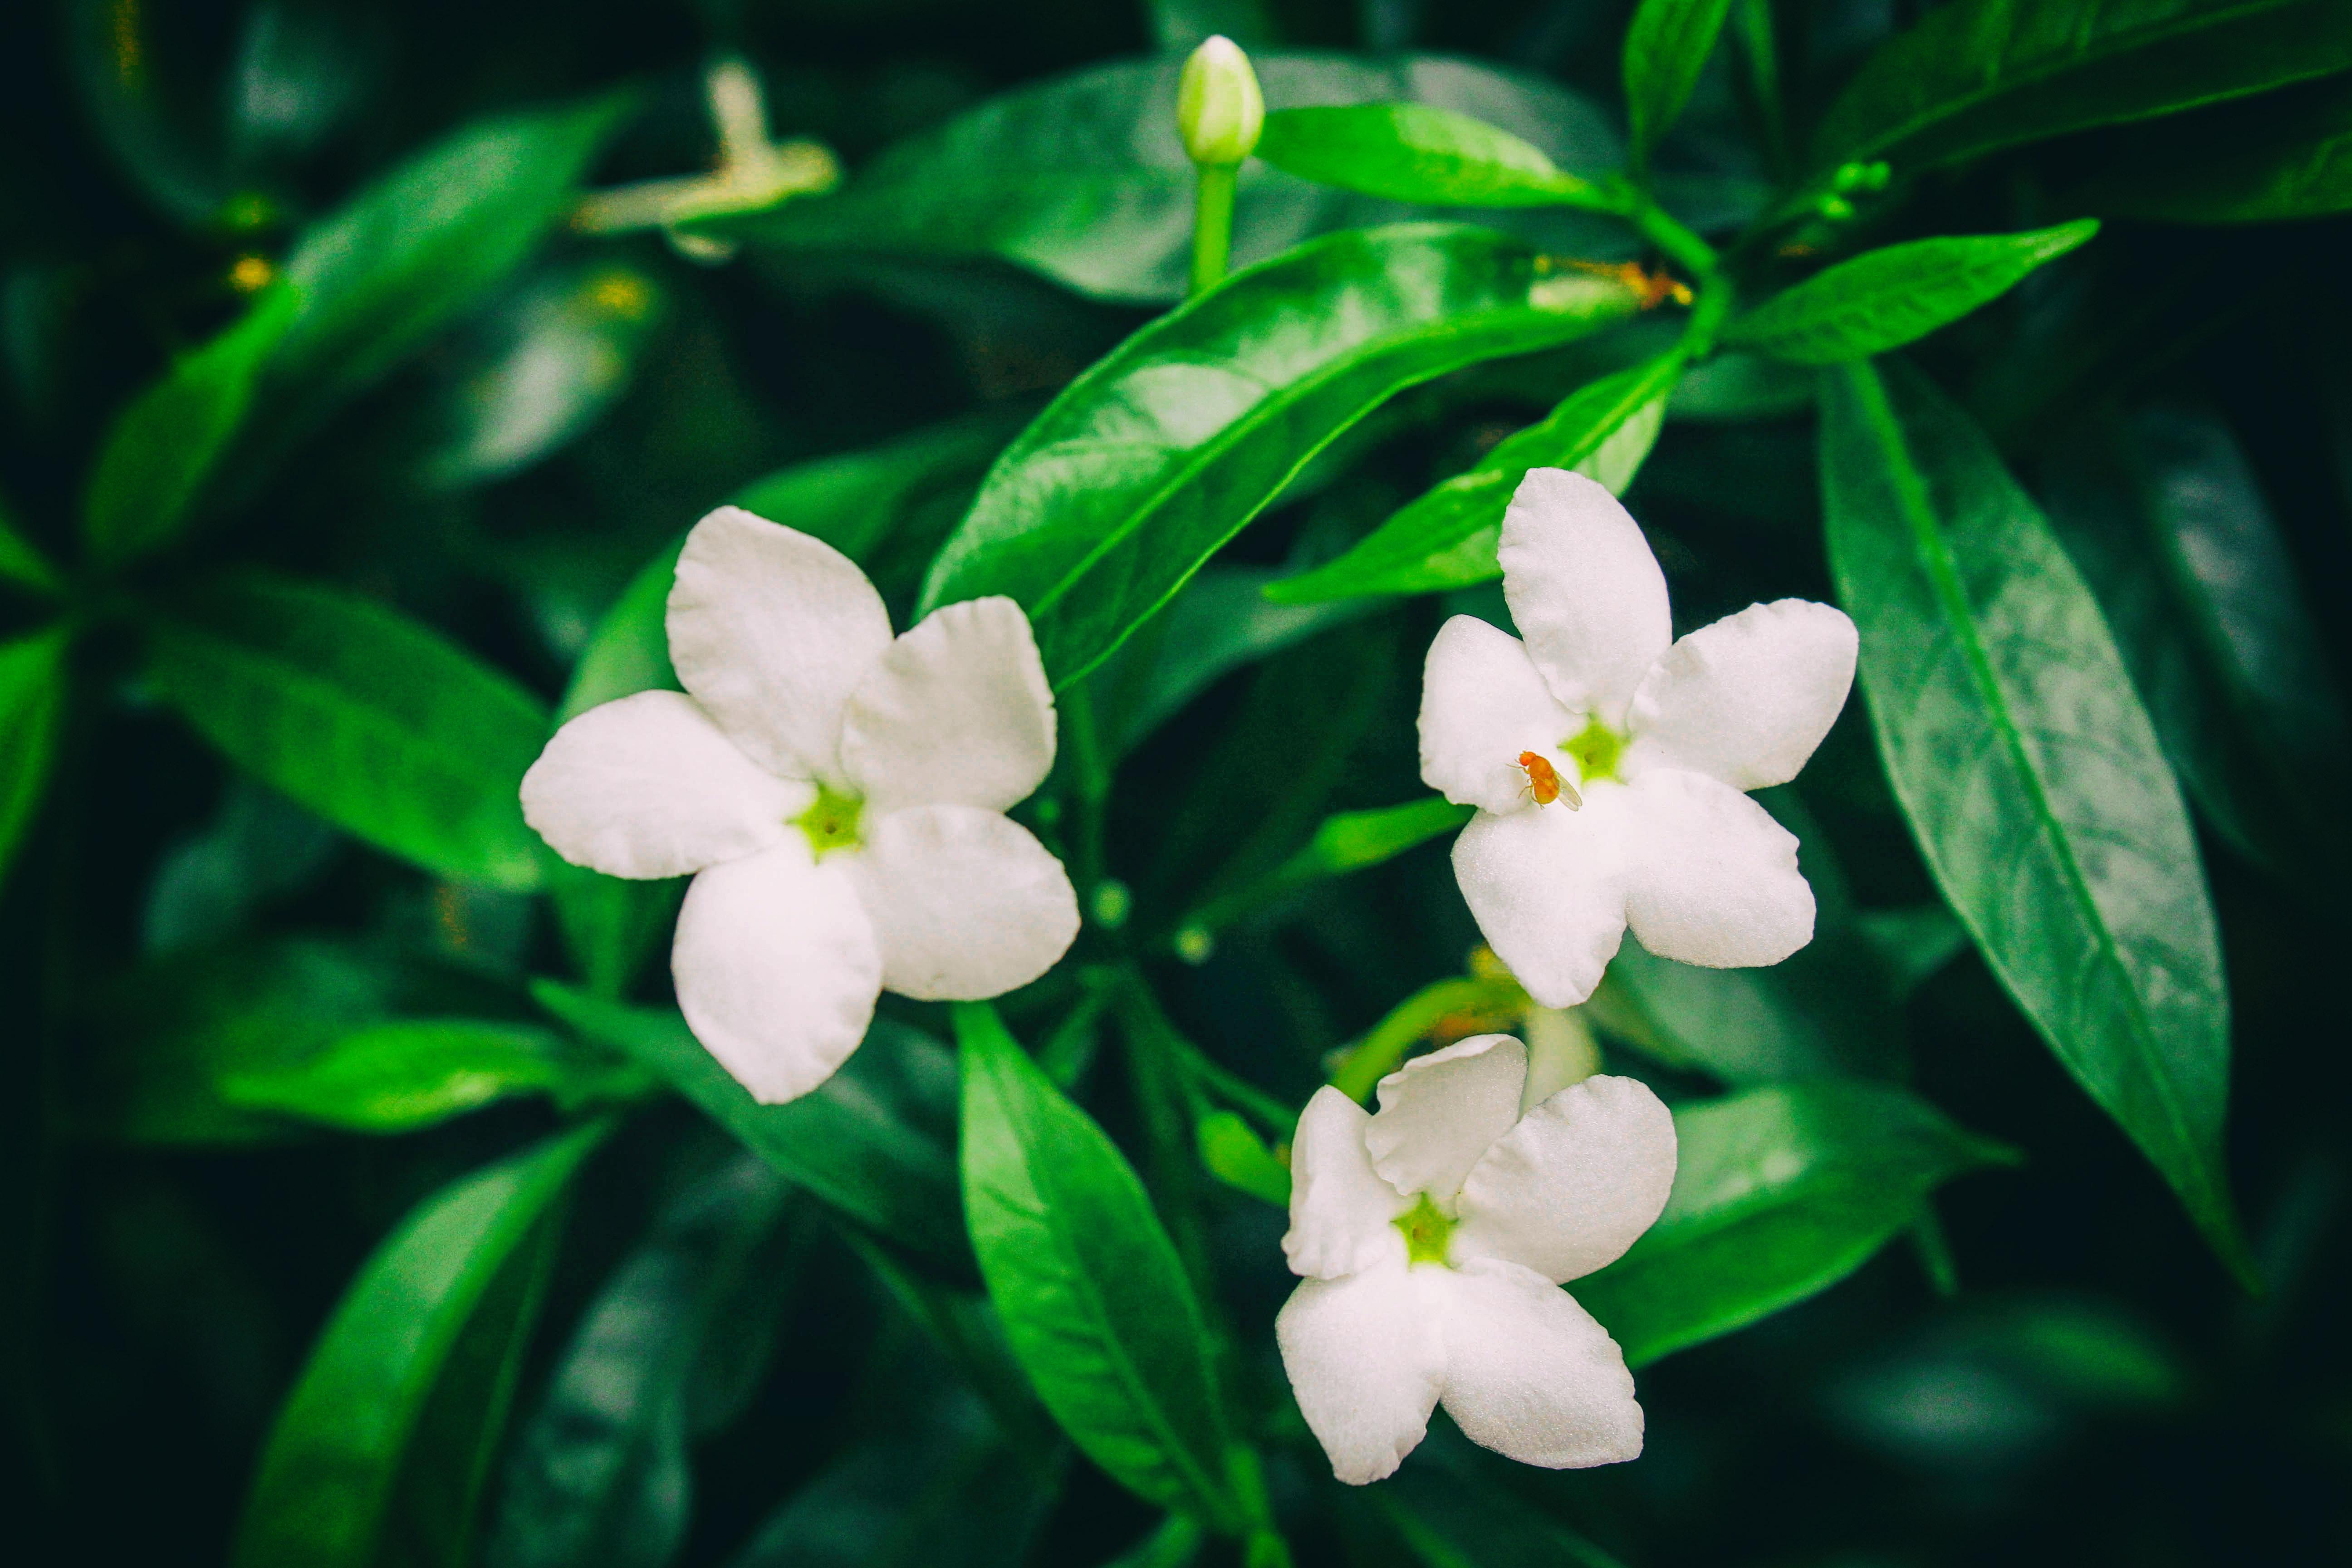 Free stock photo of beautiful flowers close up flora flower hd free download izmirmasajfo